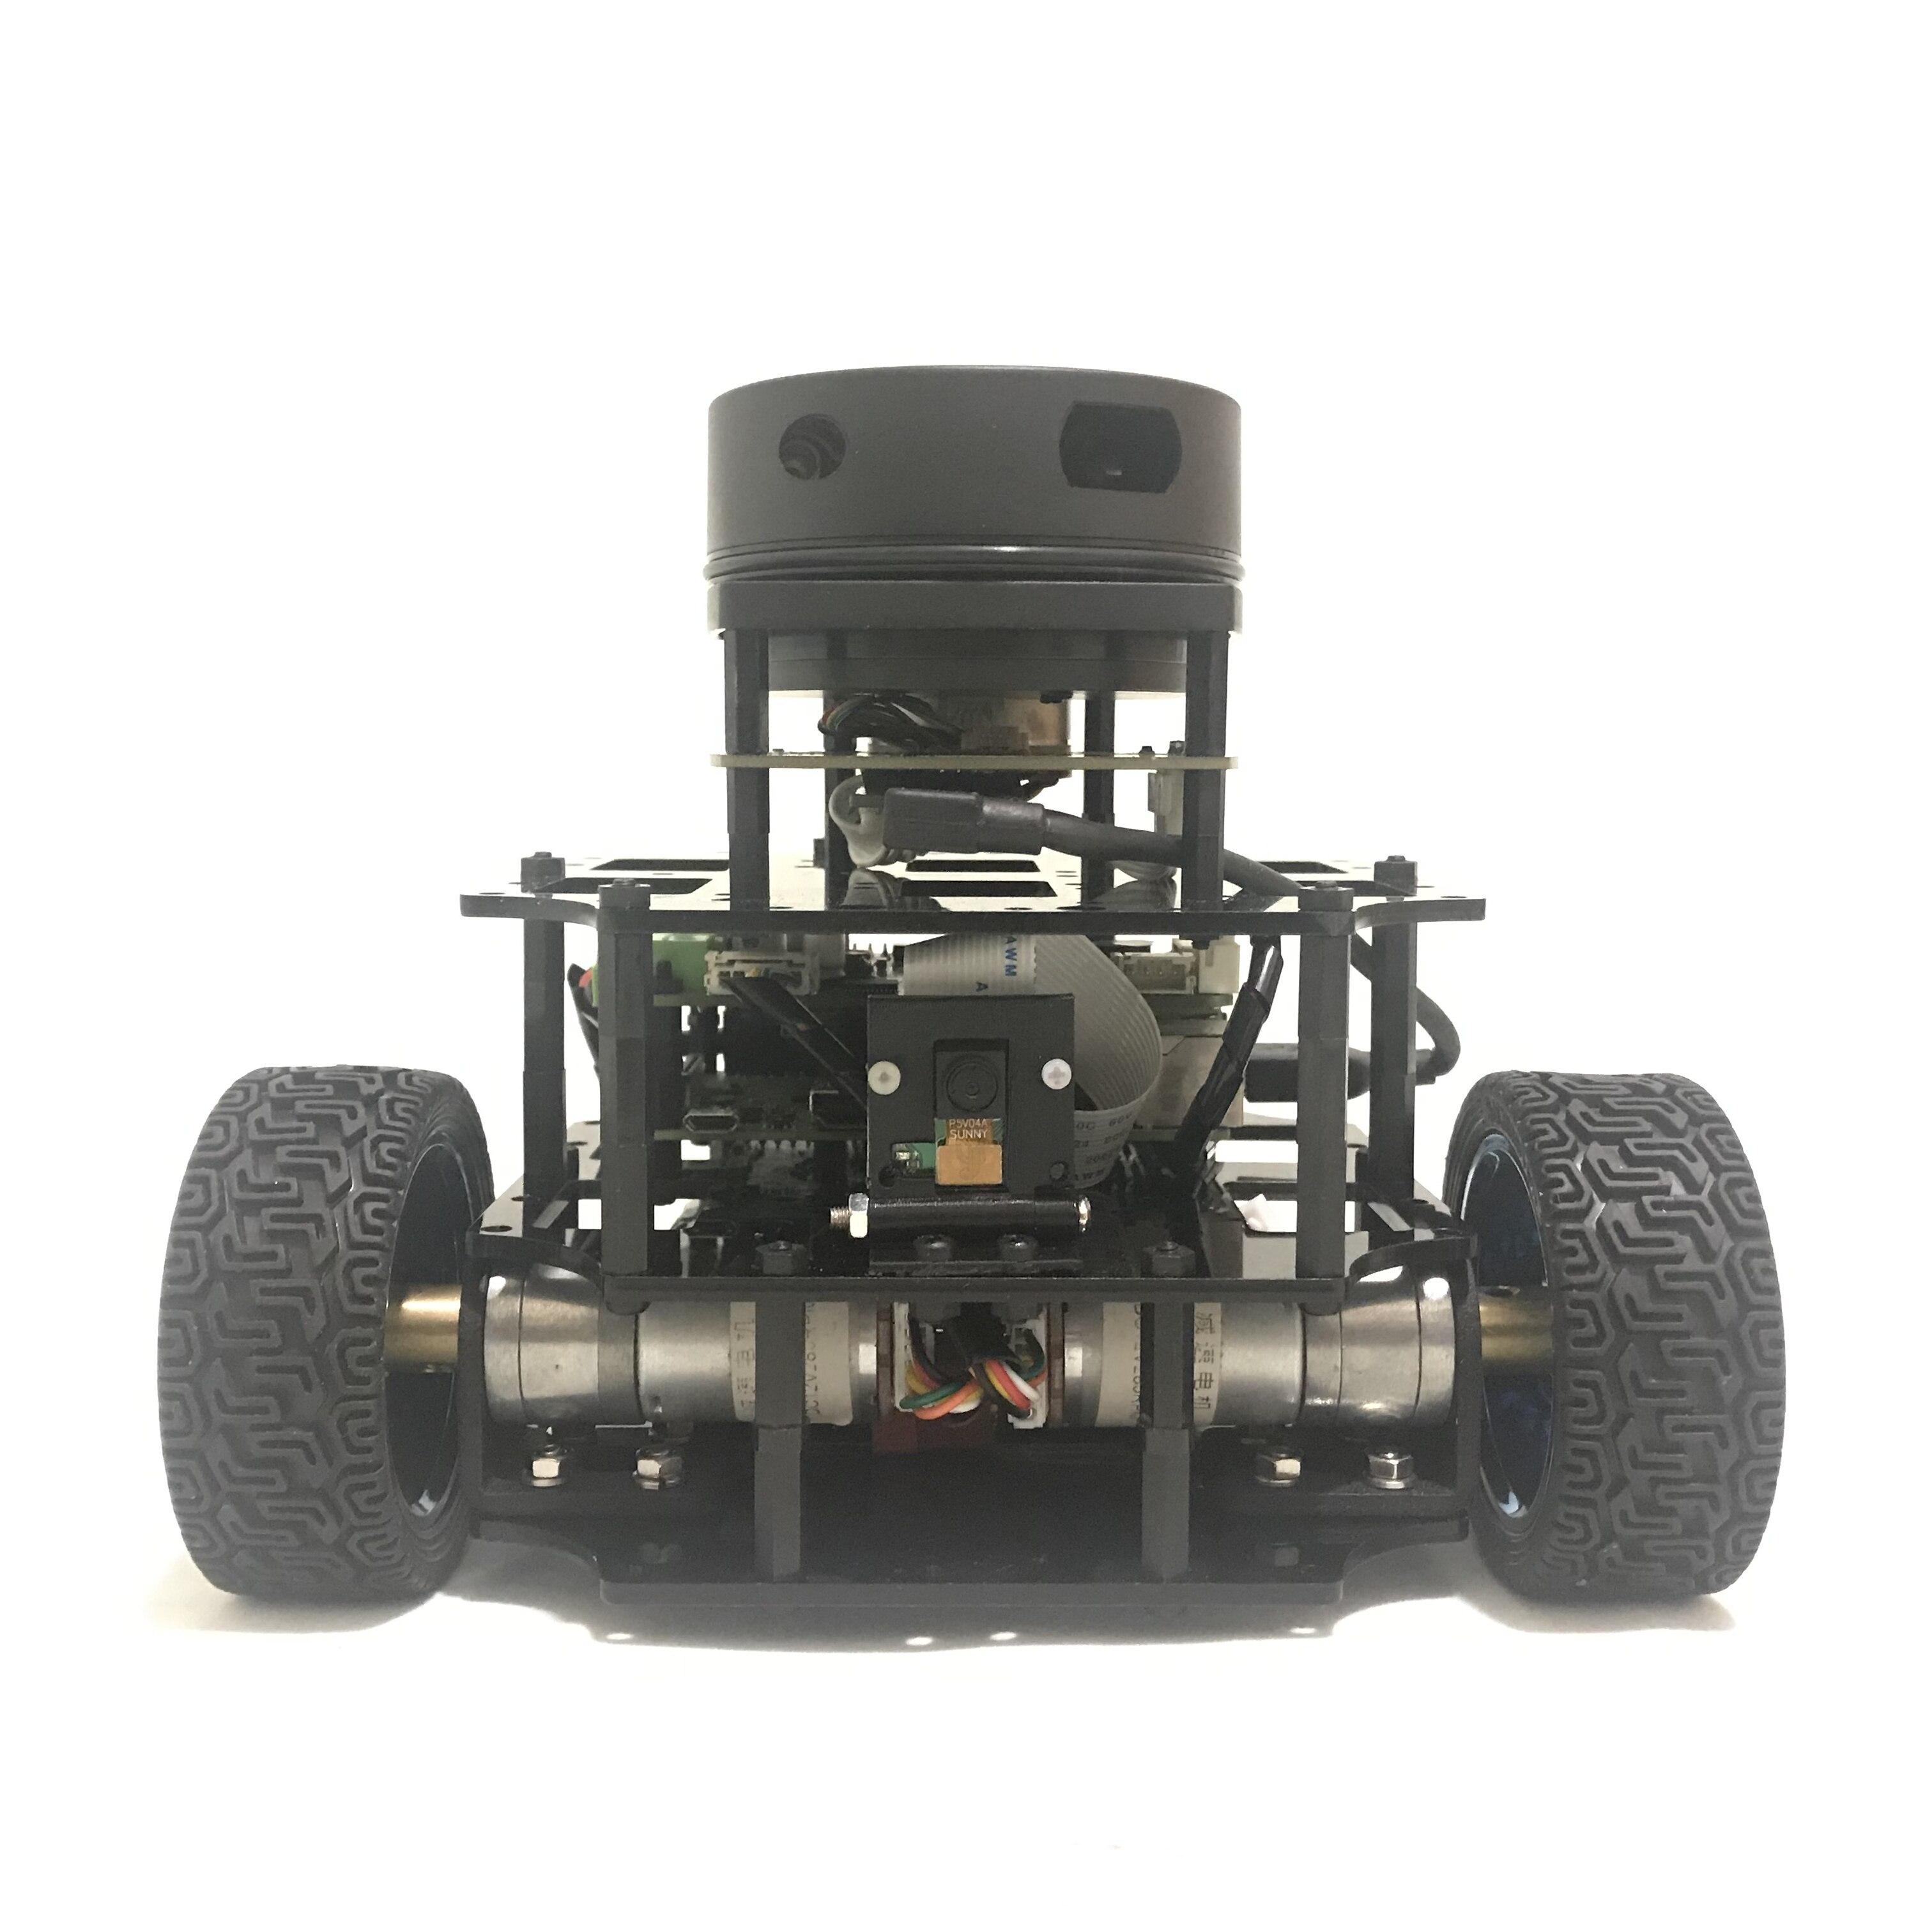 Tools : ROS Robot Smart Car SLAM Construction Map Navigation Development Learning Kit Super Turtlebot3